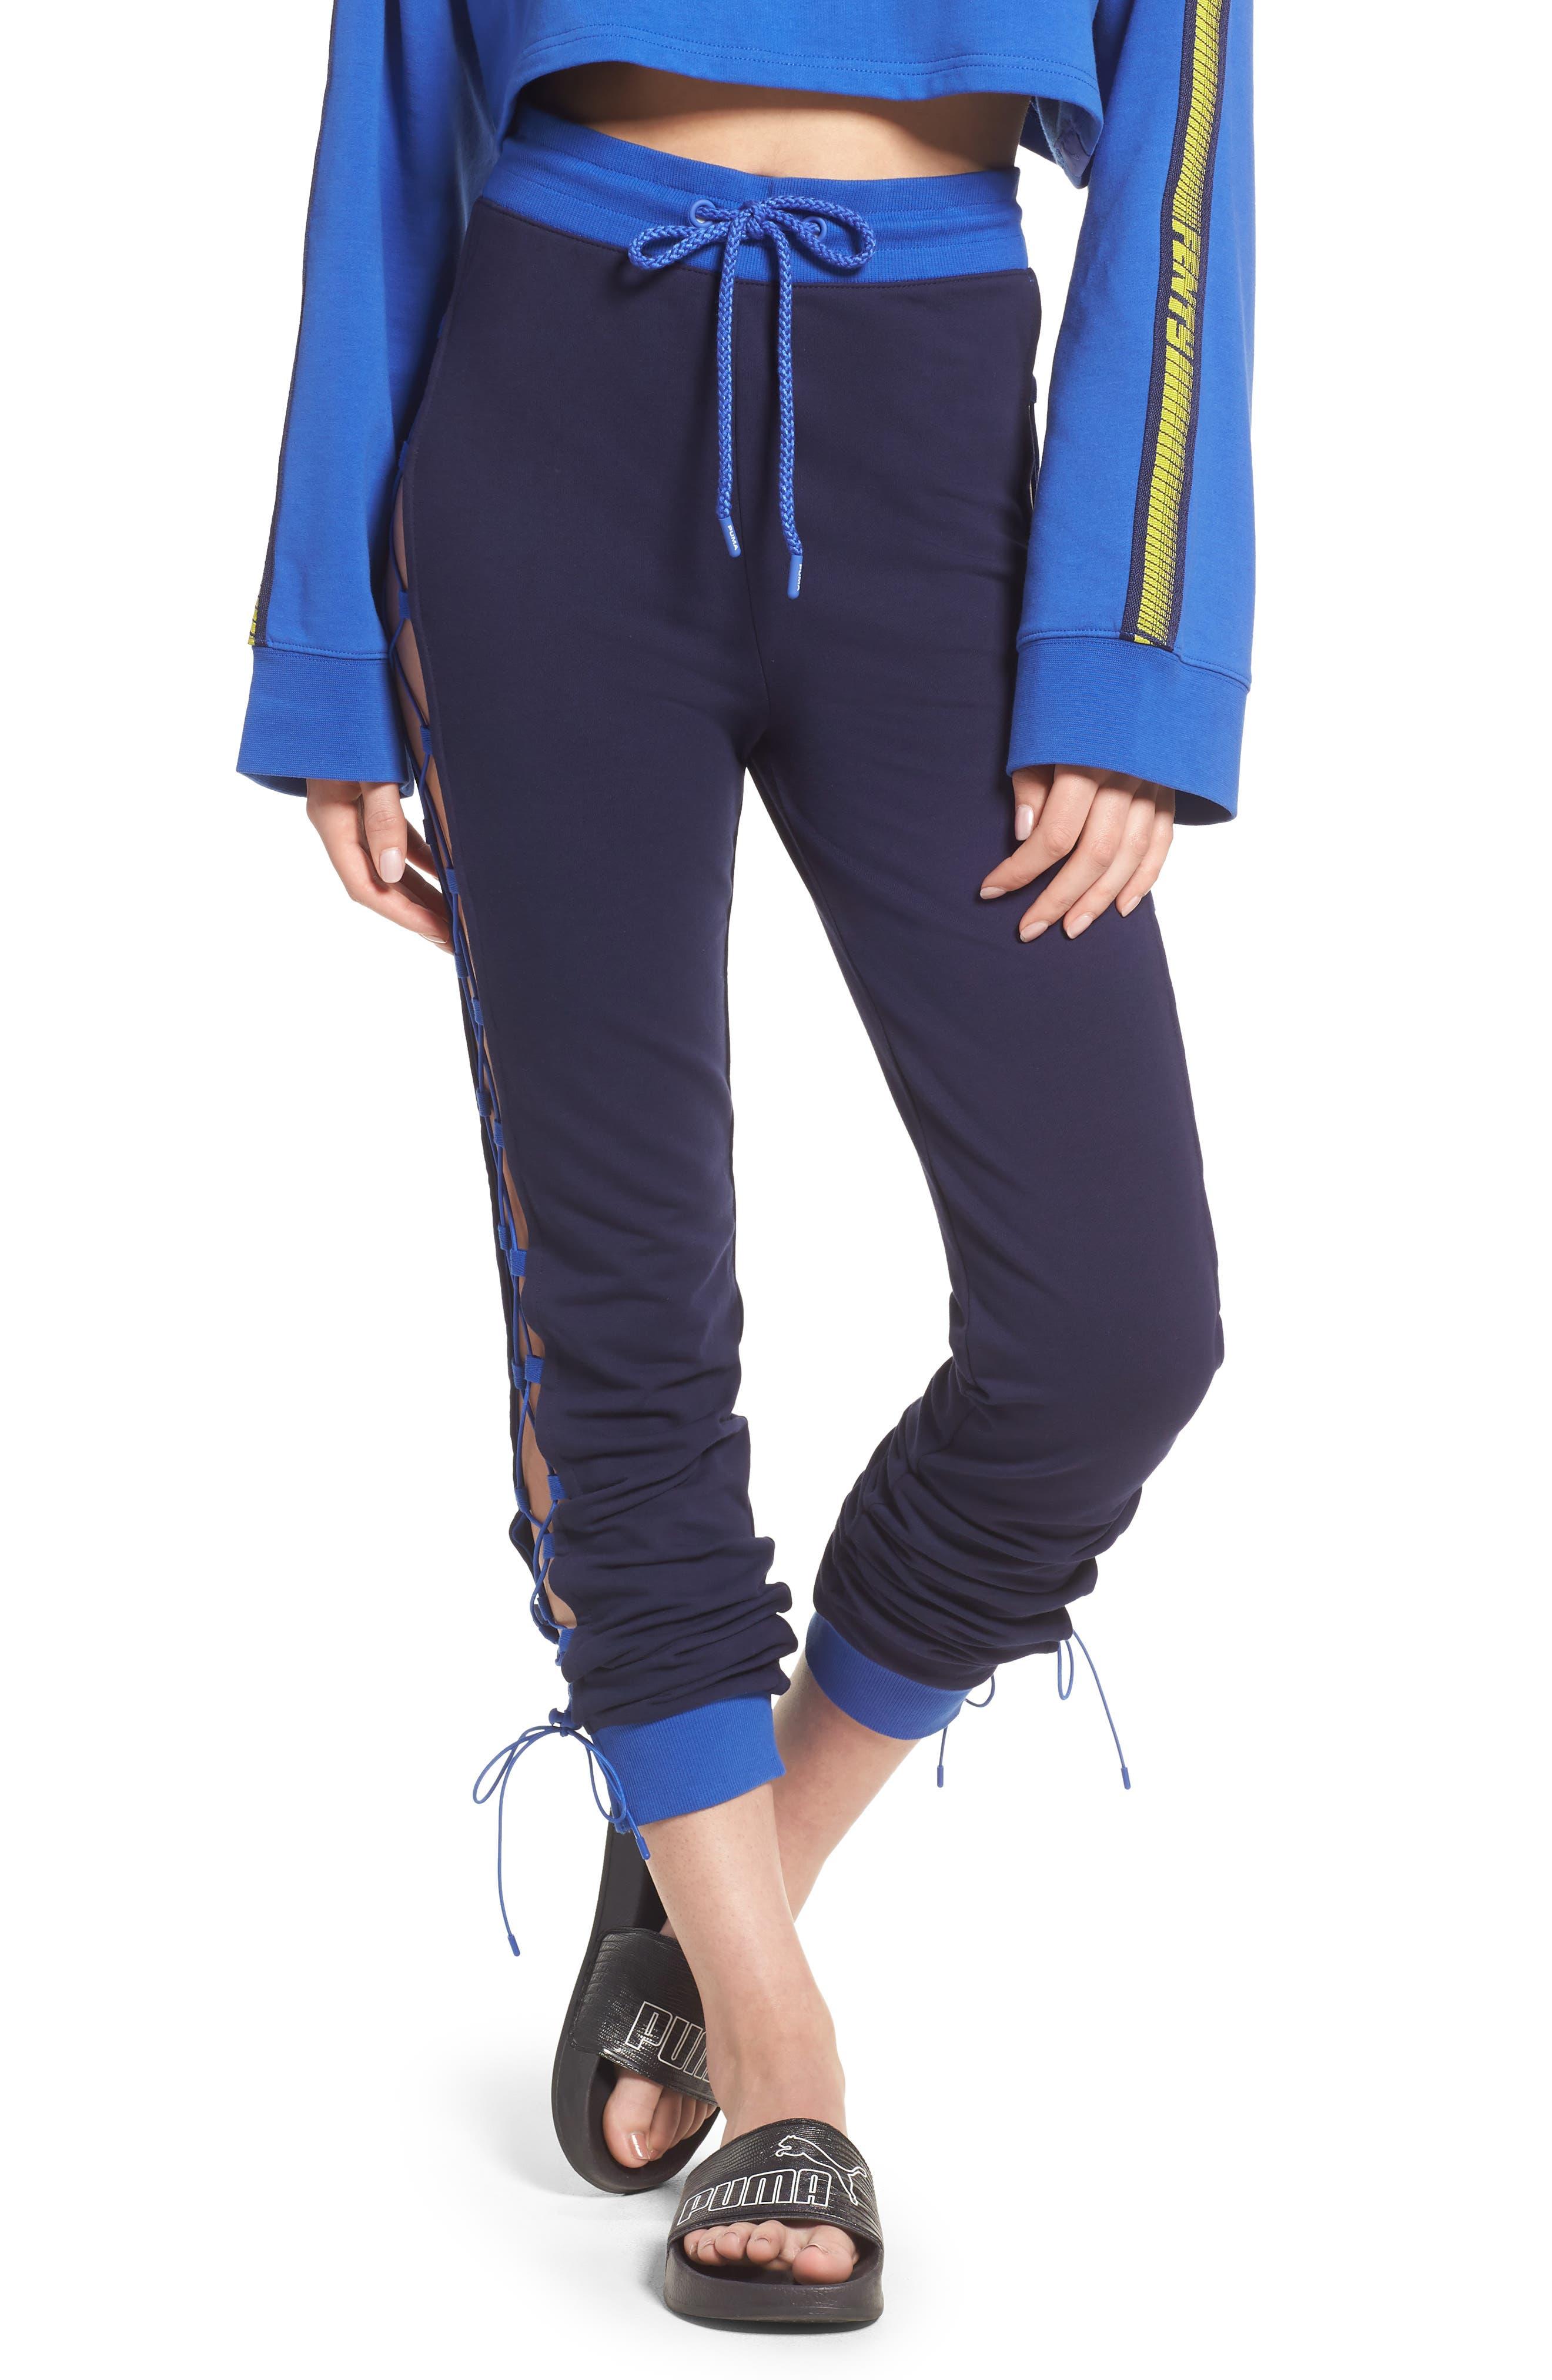 FENTY PUMA by Rihanna Lace-Up Sweatpants,                         Main,                         color, 400